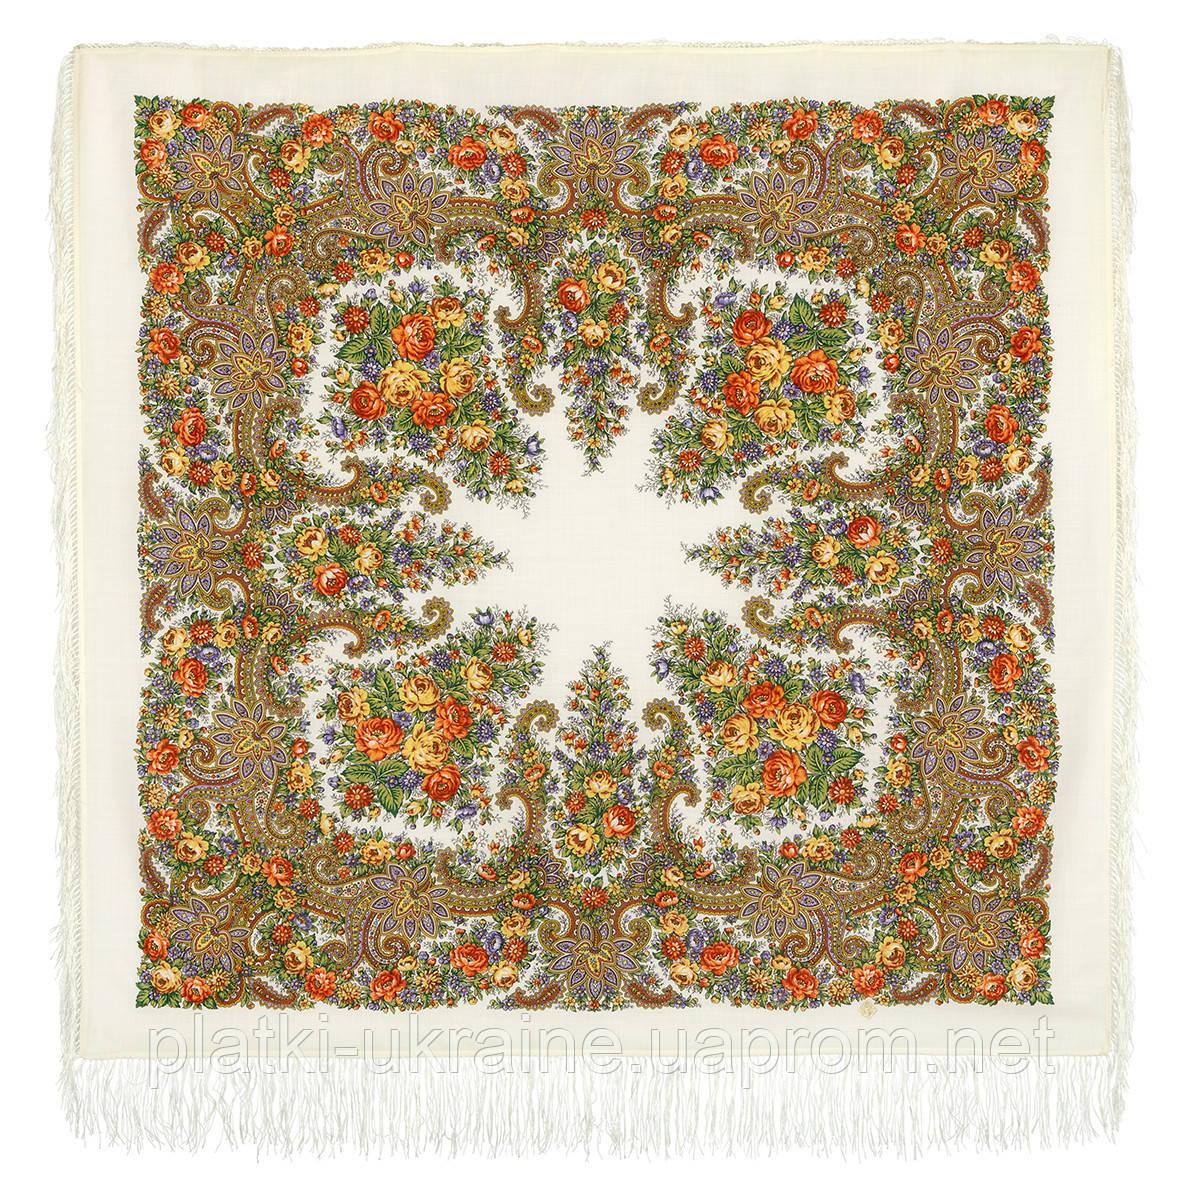 "Платок шерстяной с шелковой бахромой ""Лира"", вид 1, 125х125 см"